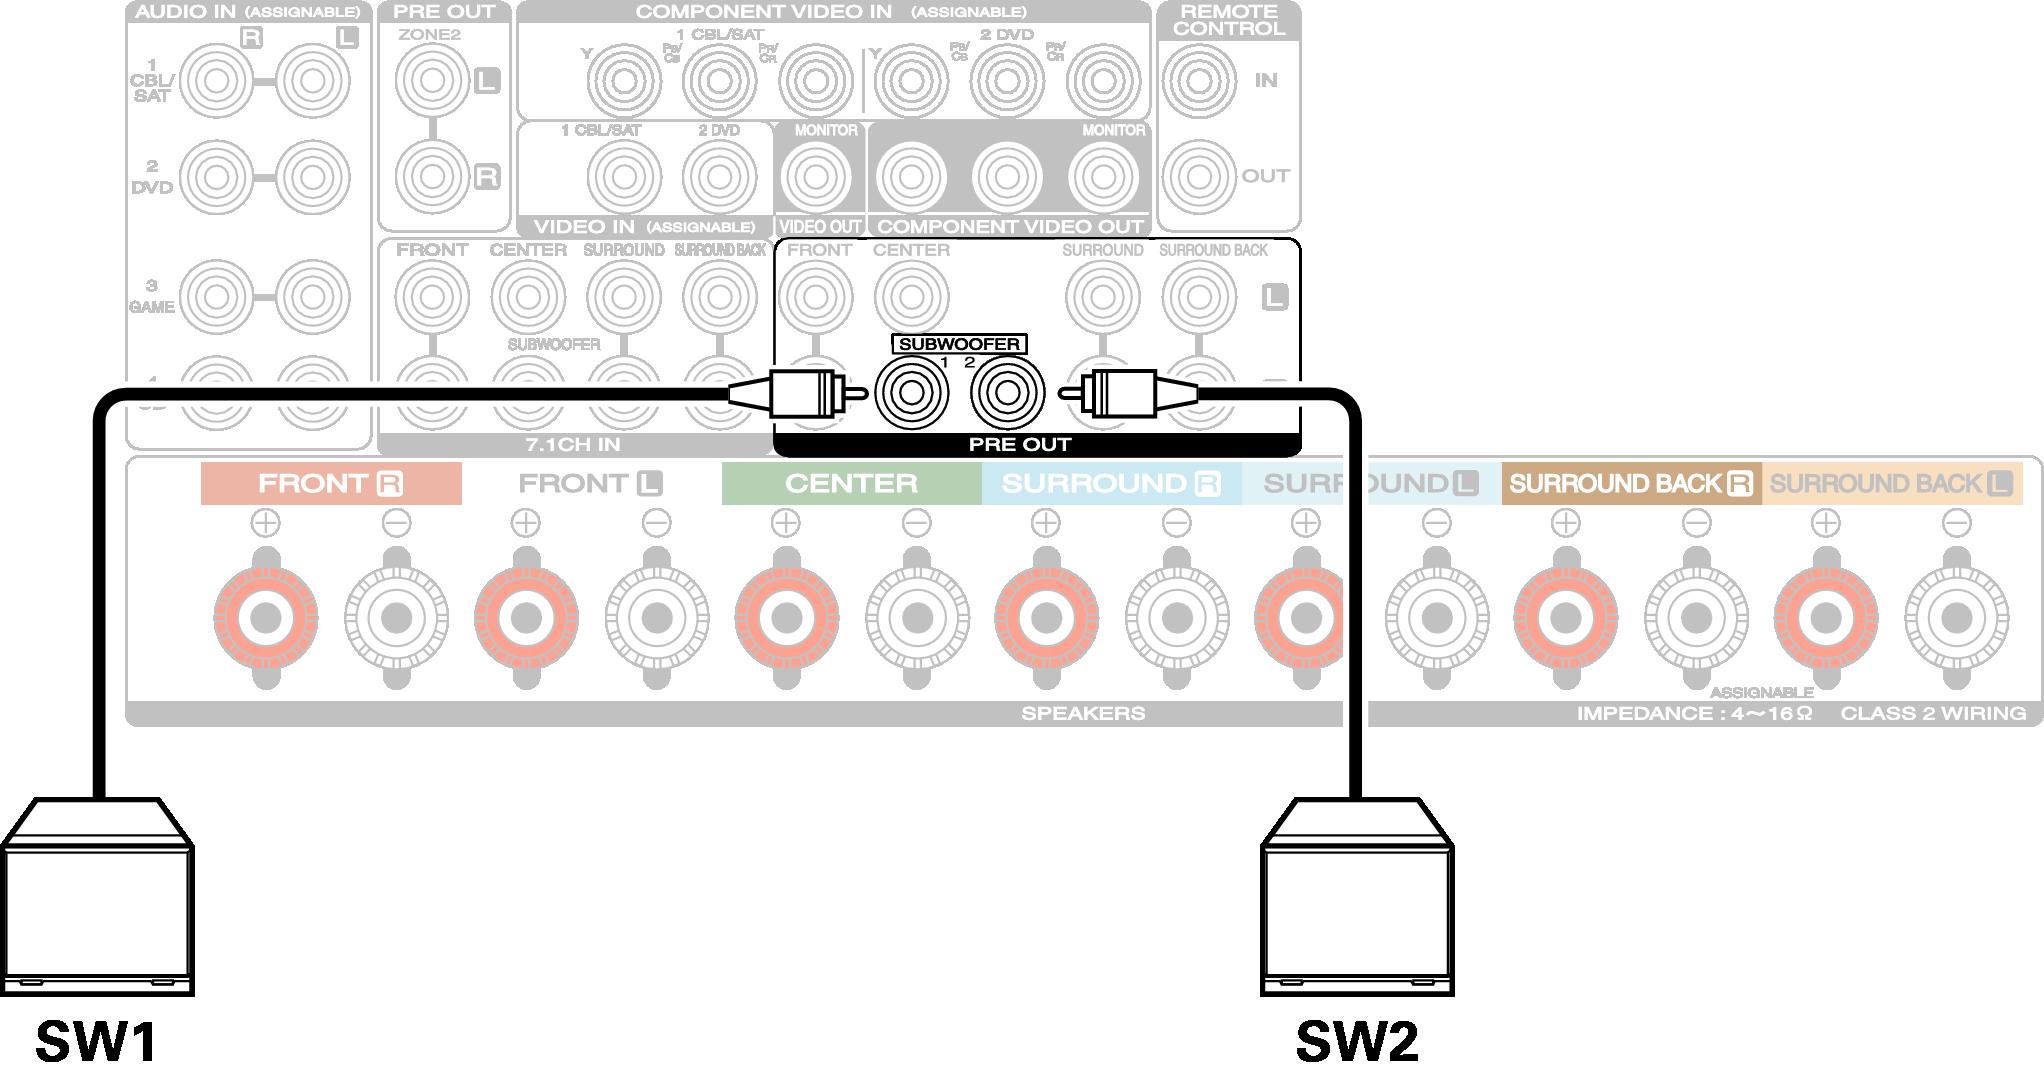 Speaker Connection Sr5009 Class 2 Audio Wiring Conne Sw2